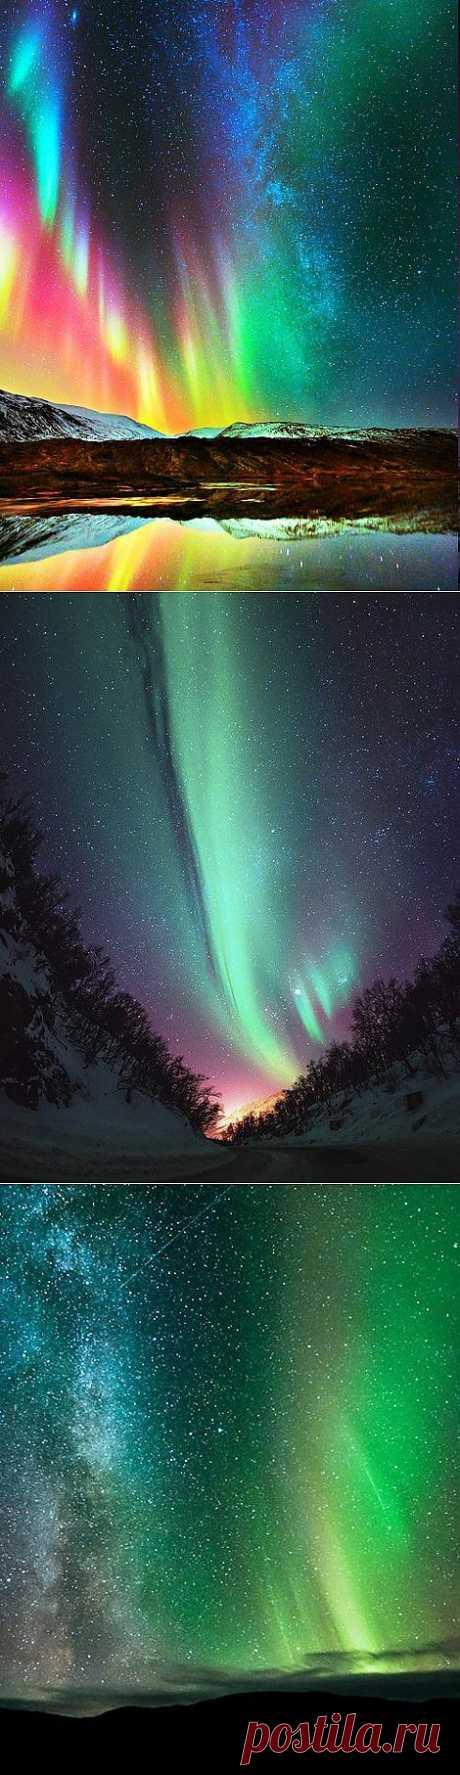 Divine sign: polar lights